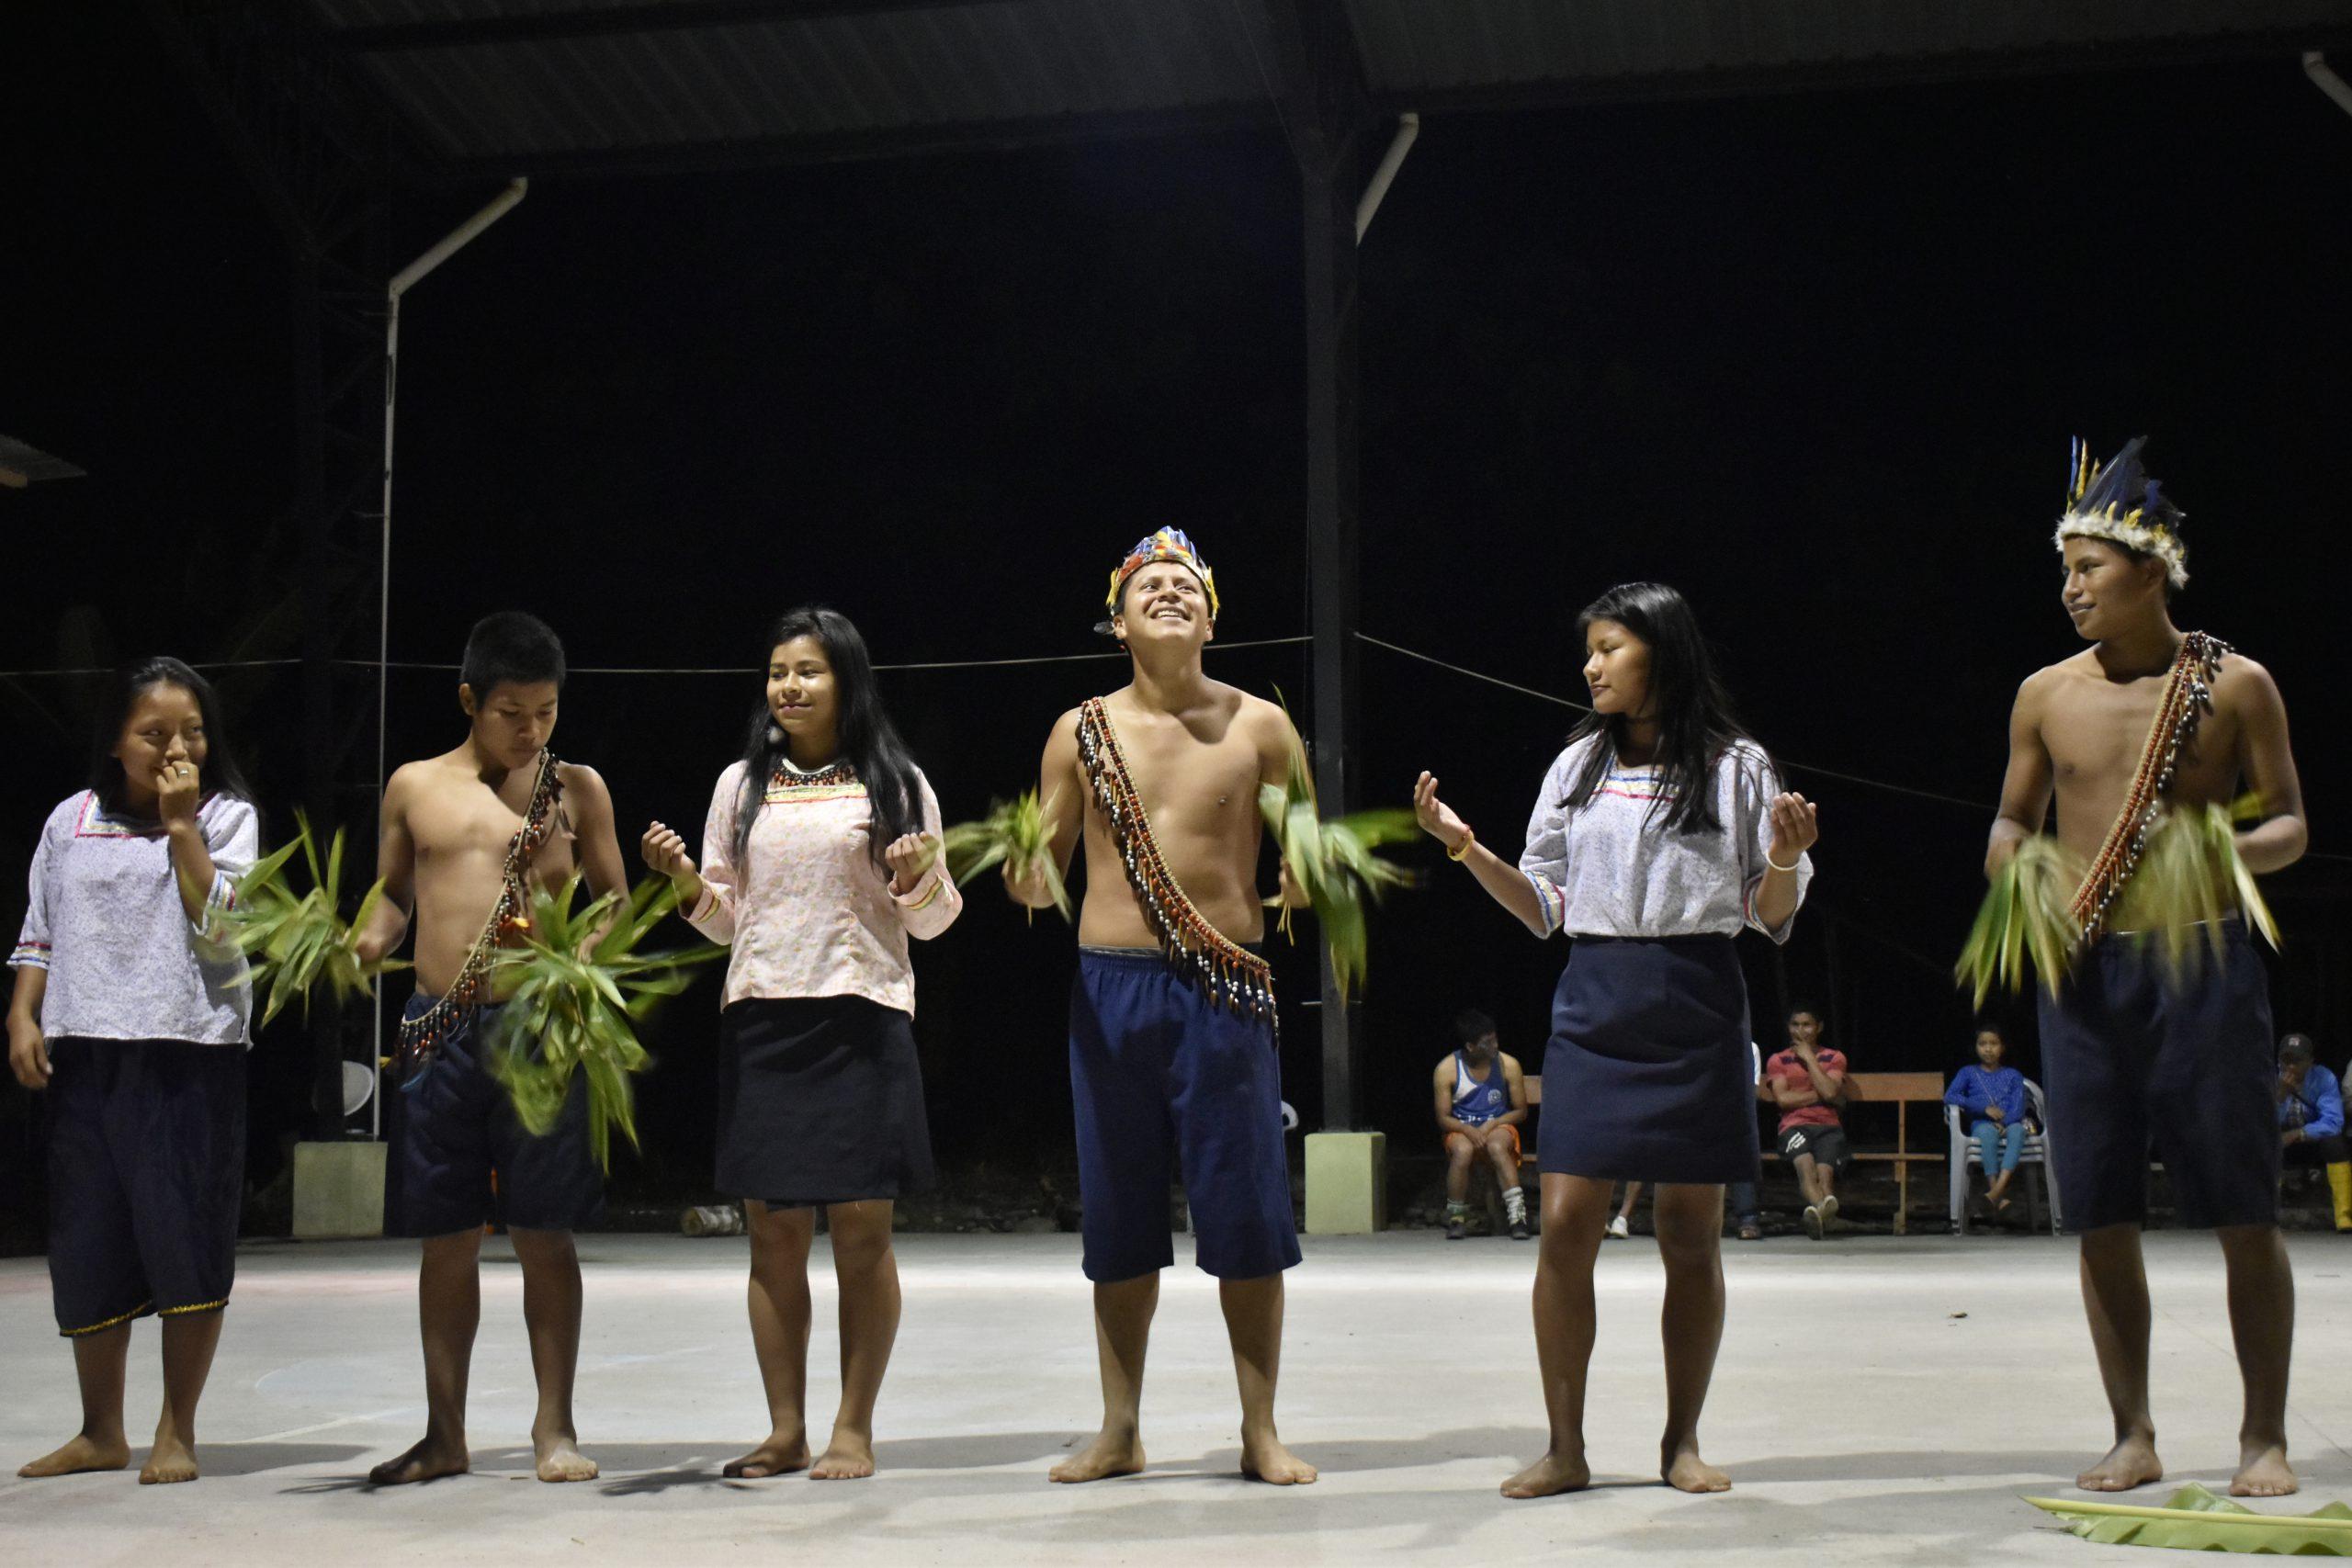 school_expedition_ecuador_scuba_traditional_dancing